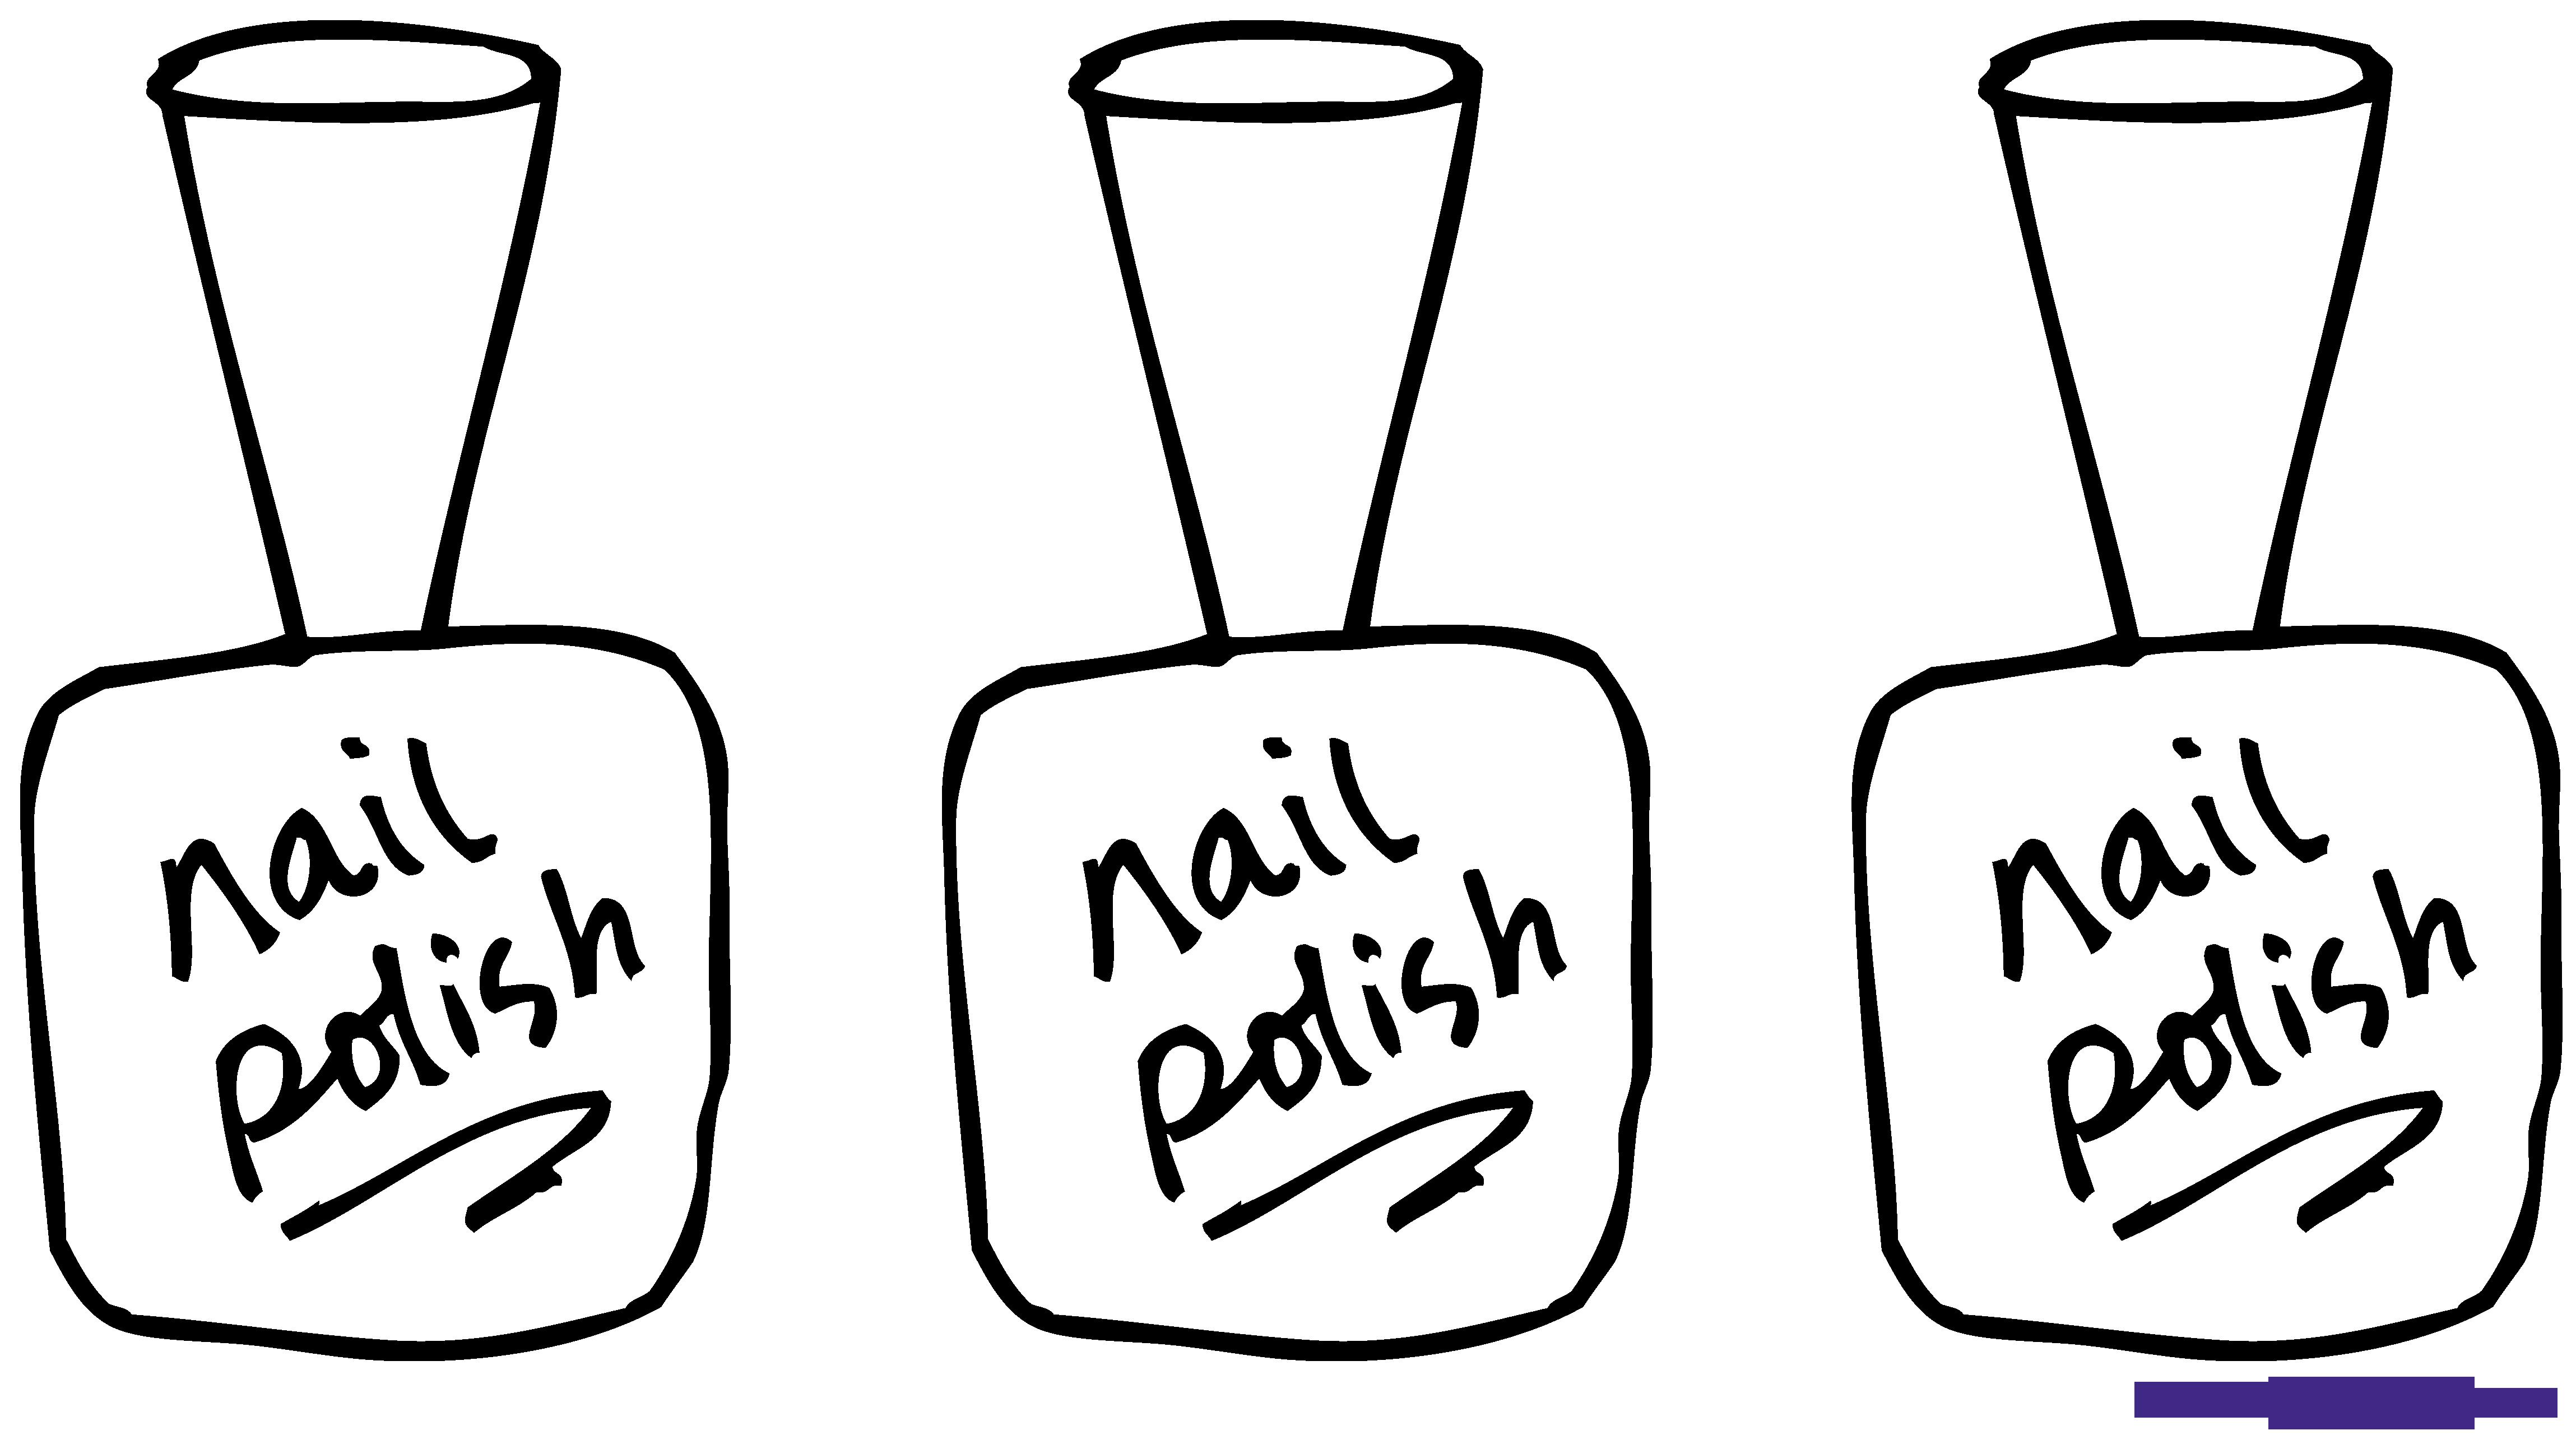 Nail polish line art. Nails clipart christmas religious